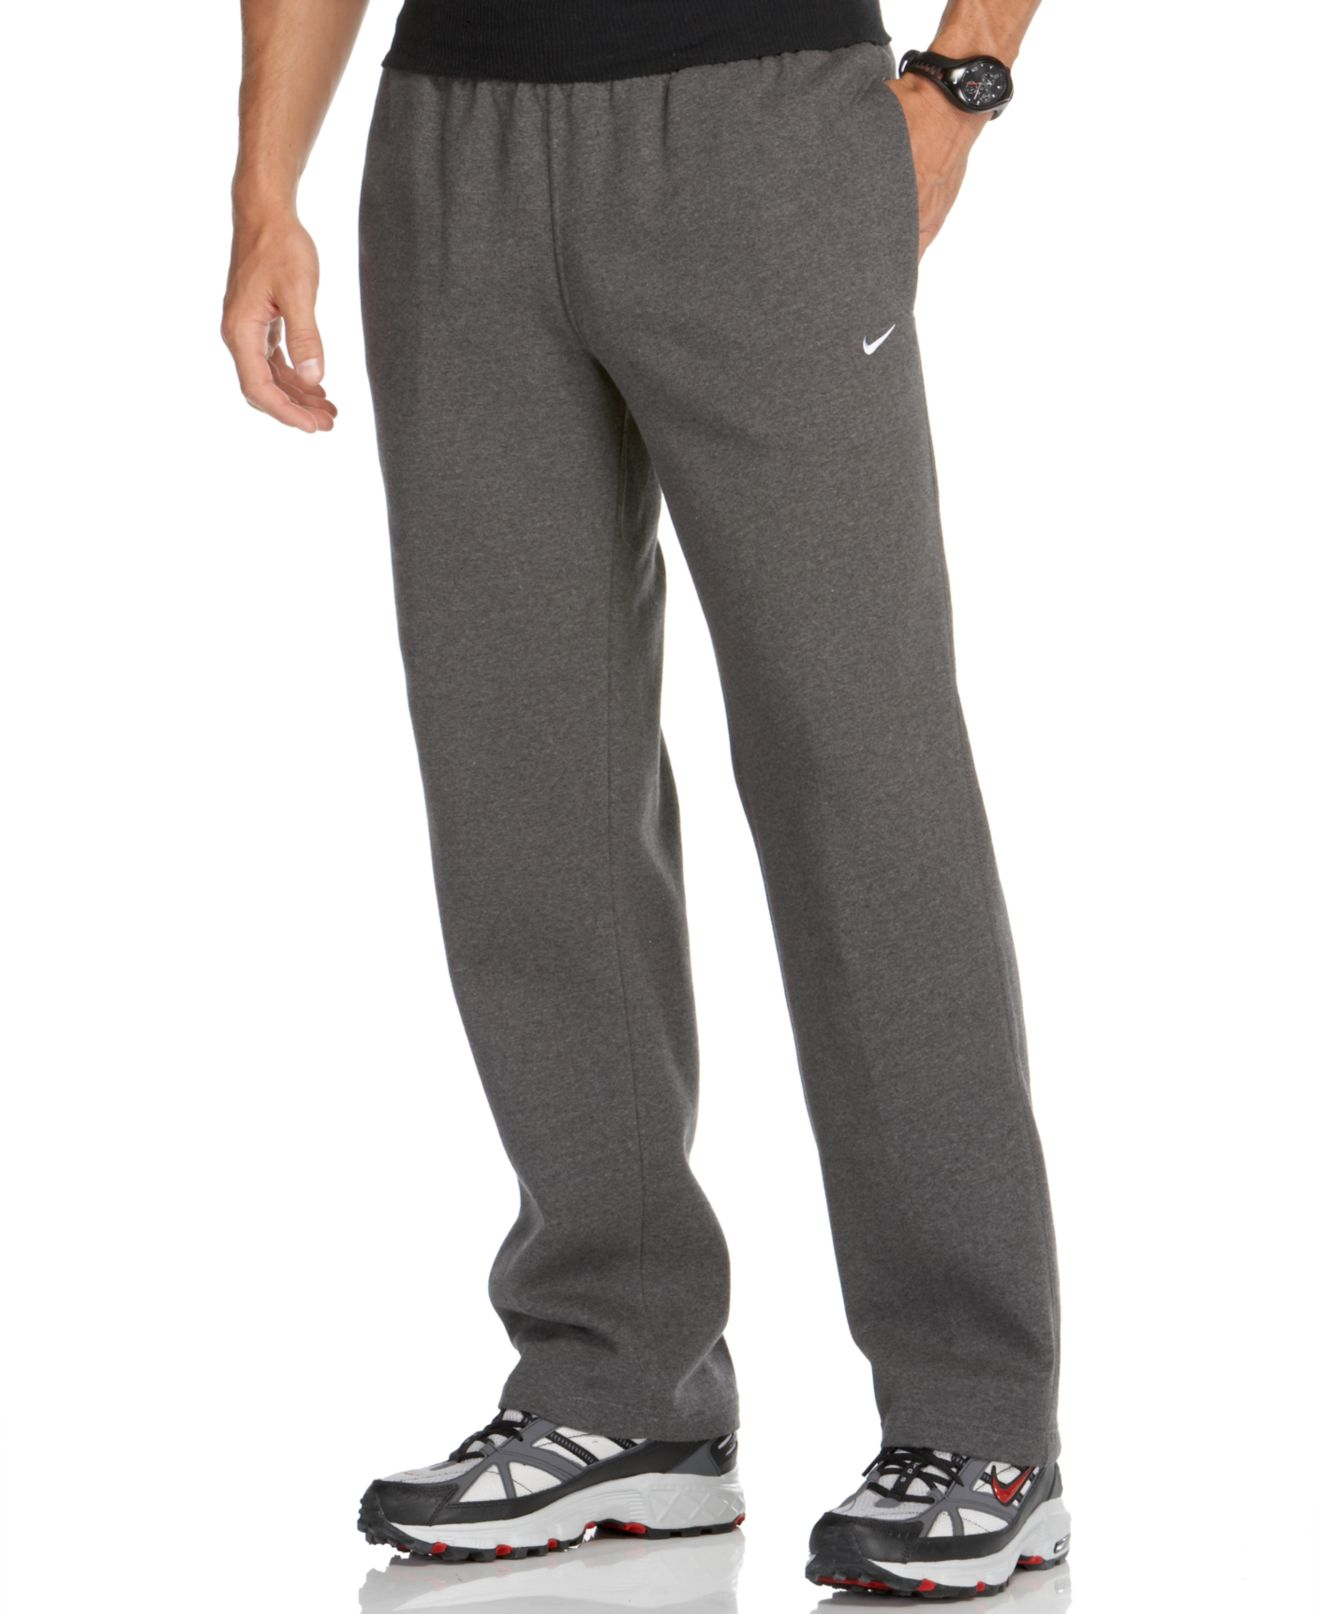 Simple Ideas About Fleece Pants On Pinterest  Nike Sweatpants Sweatpants